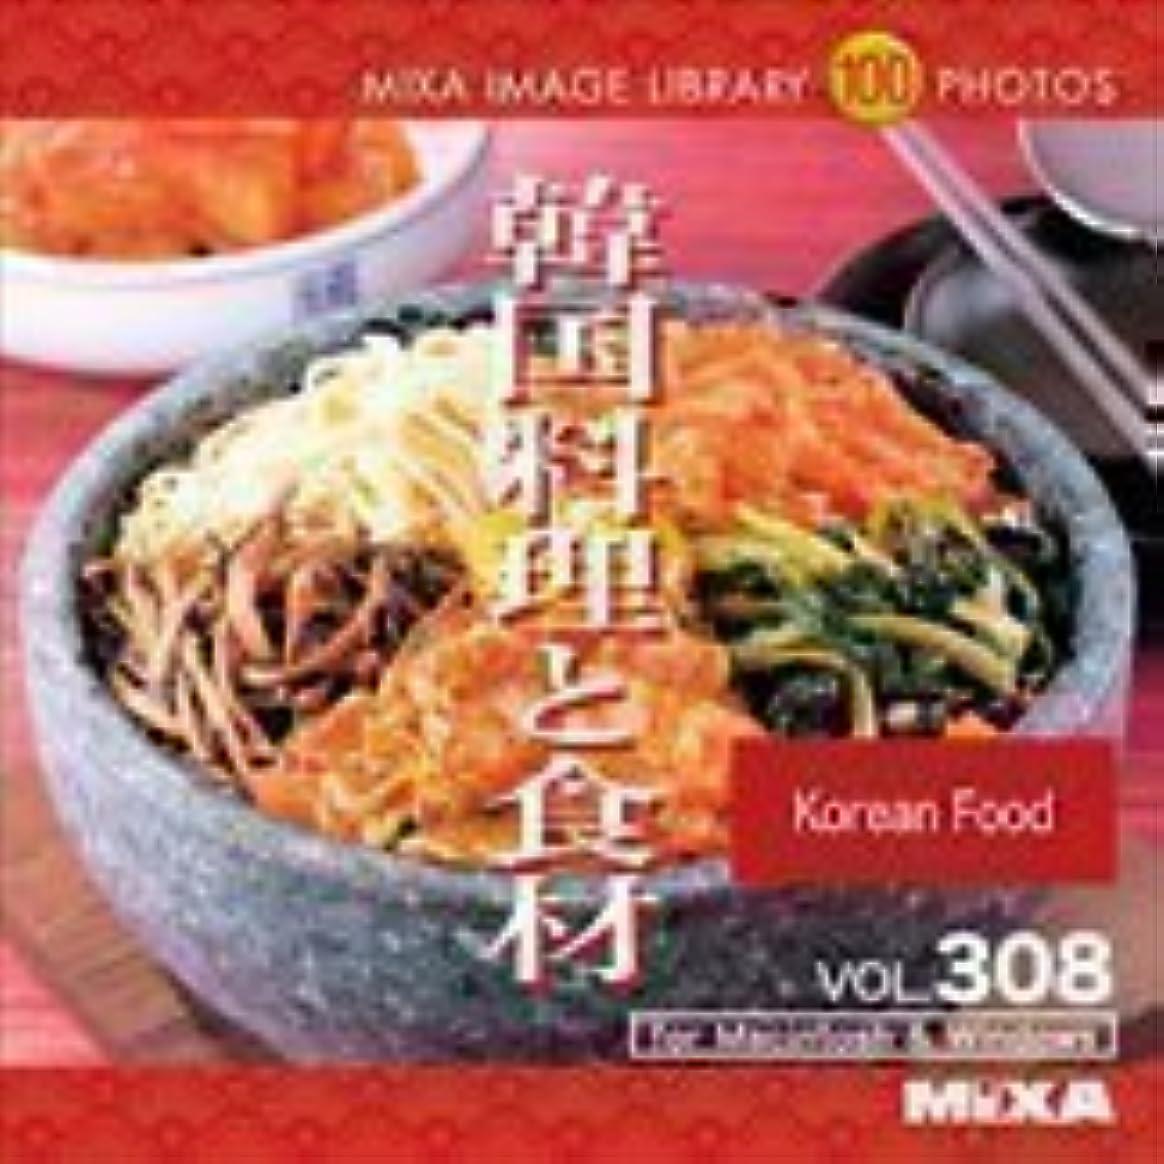 MIXA IMAGE LIBRARY Vol.308 韓国料理と食材